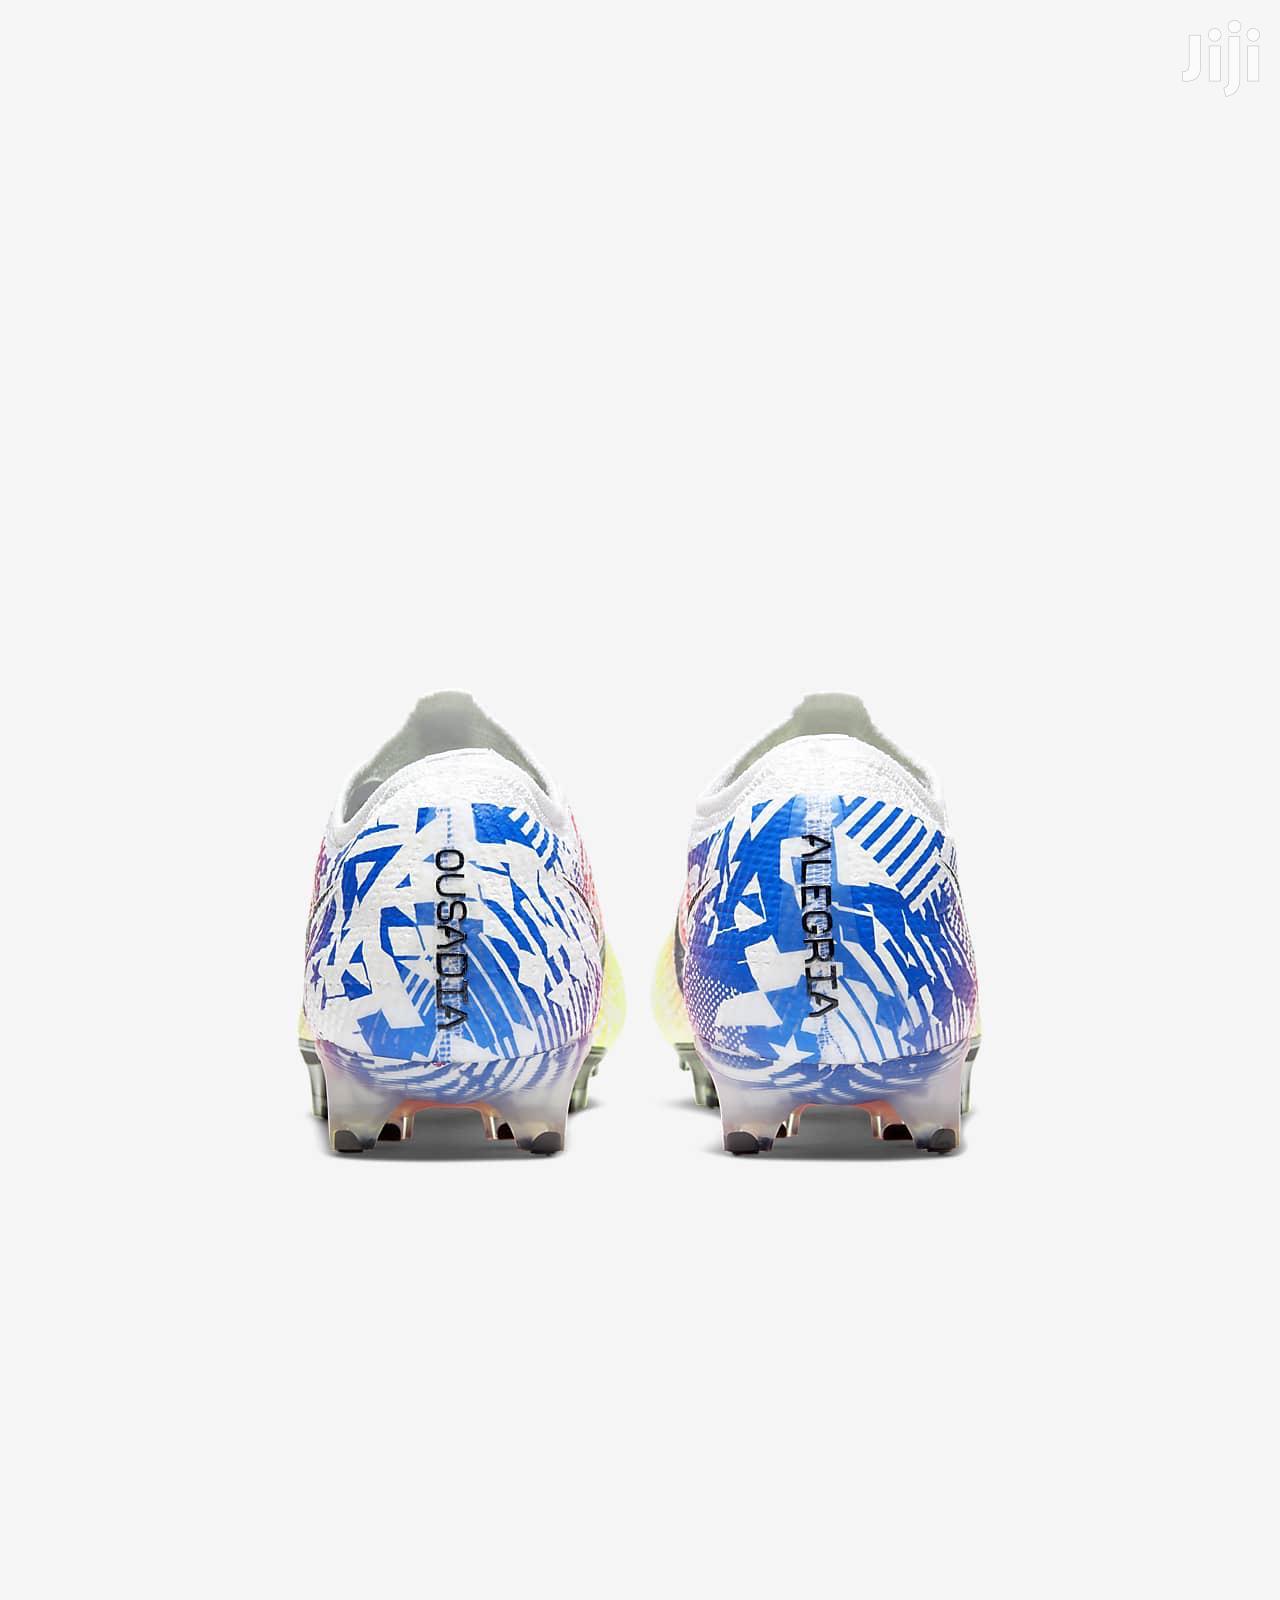 Nike Mercurial Vapor 13 Elite NJR Soccer Boots | Shoes for sale in East Legon, Greater Accra, Ghana